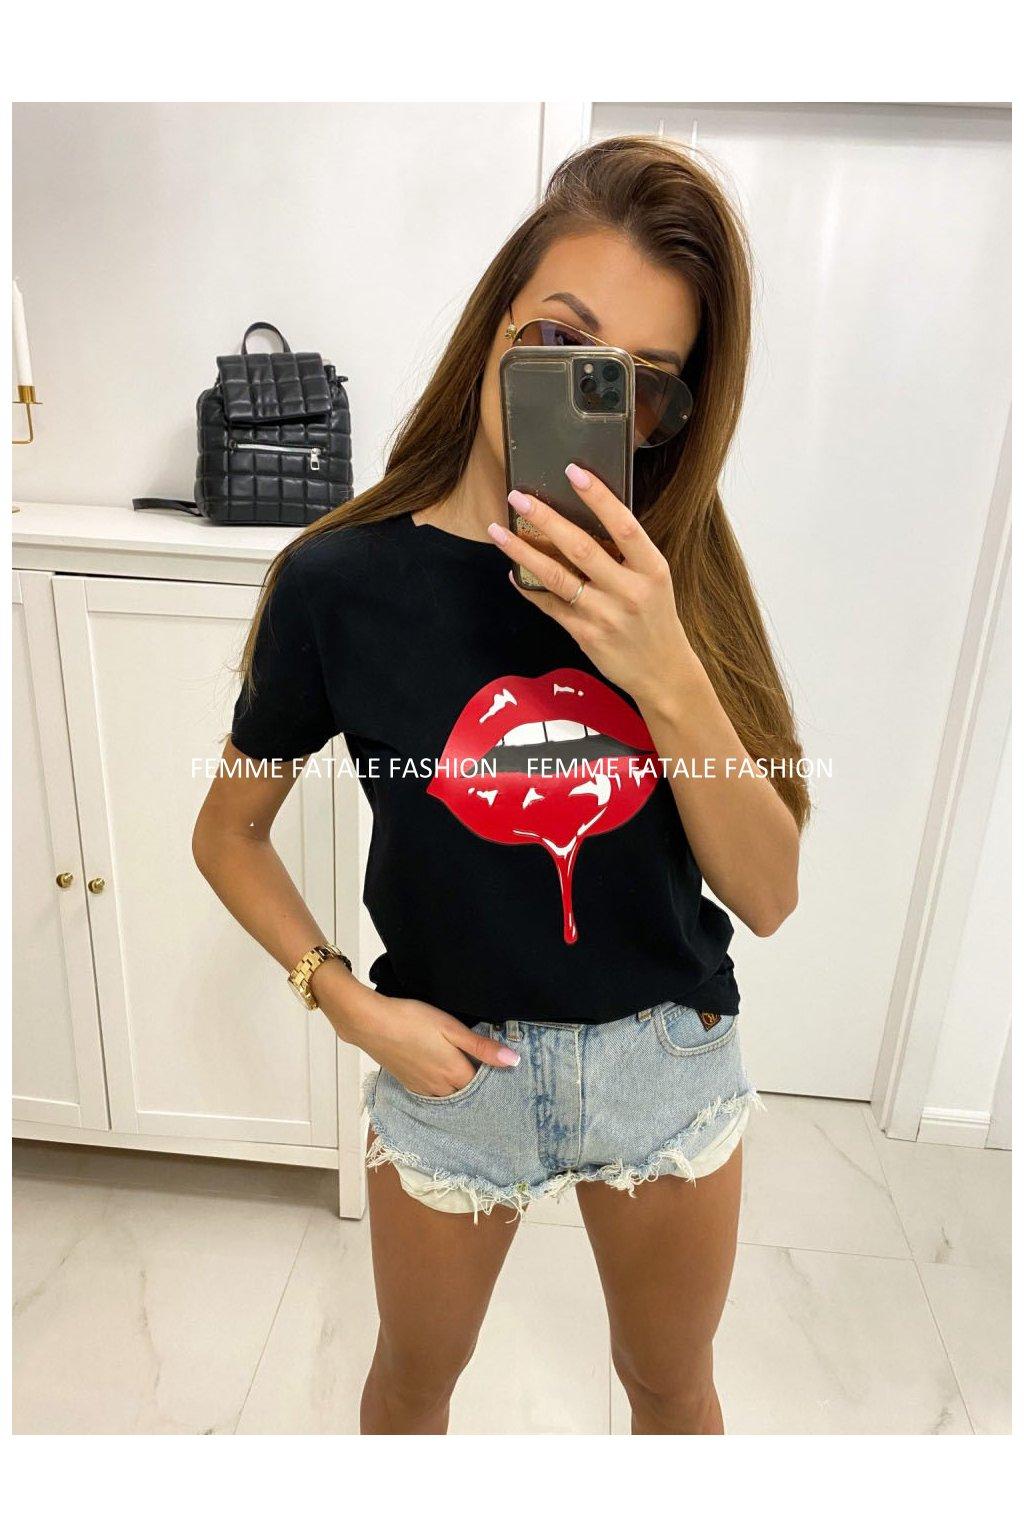 Dámské tričko RED LIPS femmefatalefashion (3)